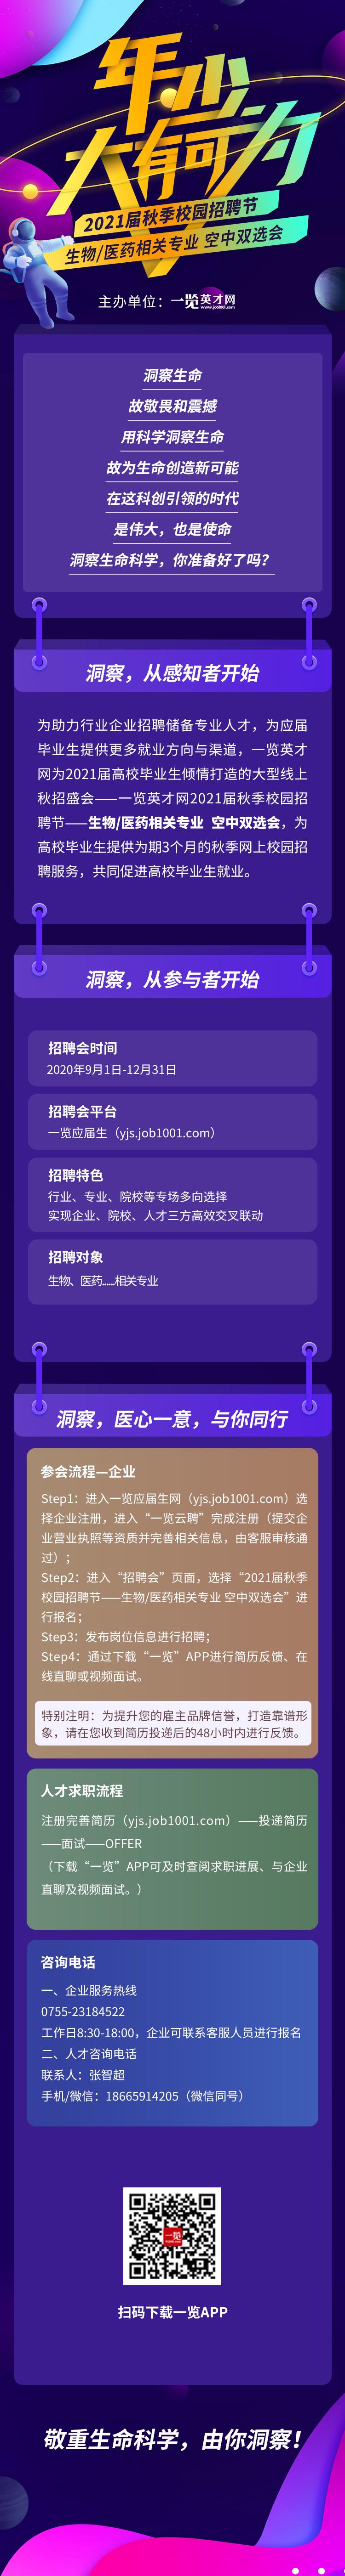 1598947074-V6FBTC4.jpg